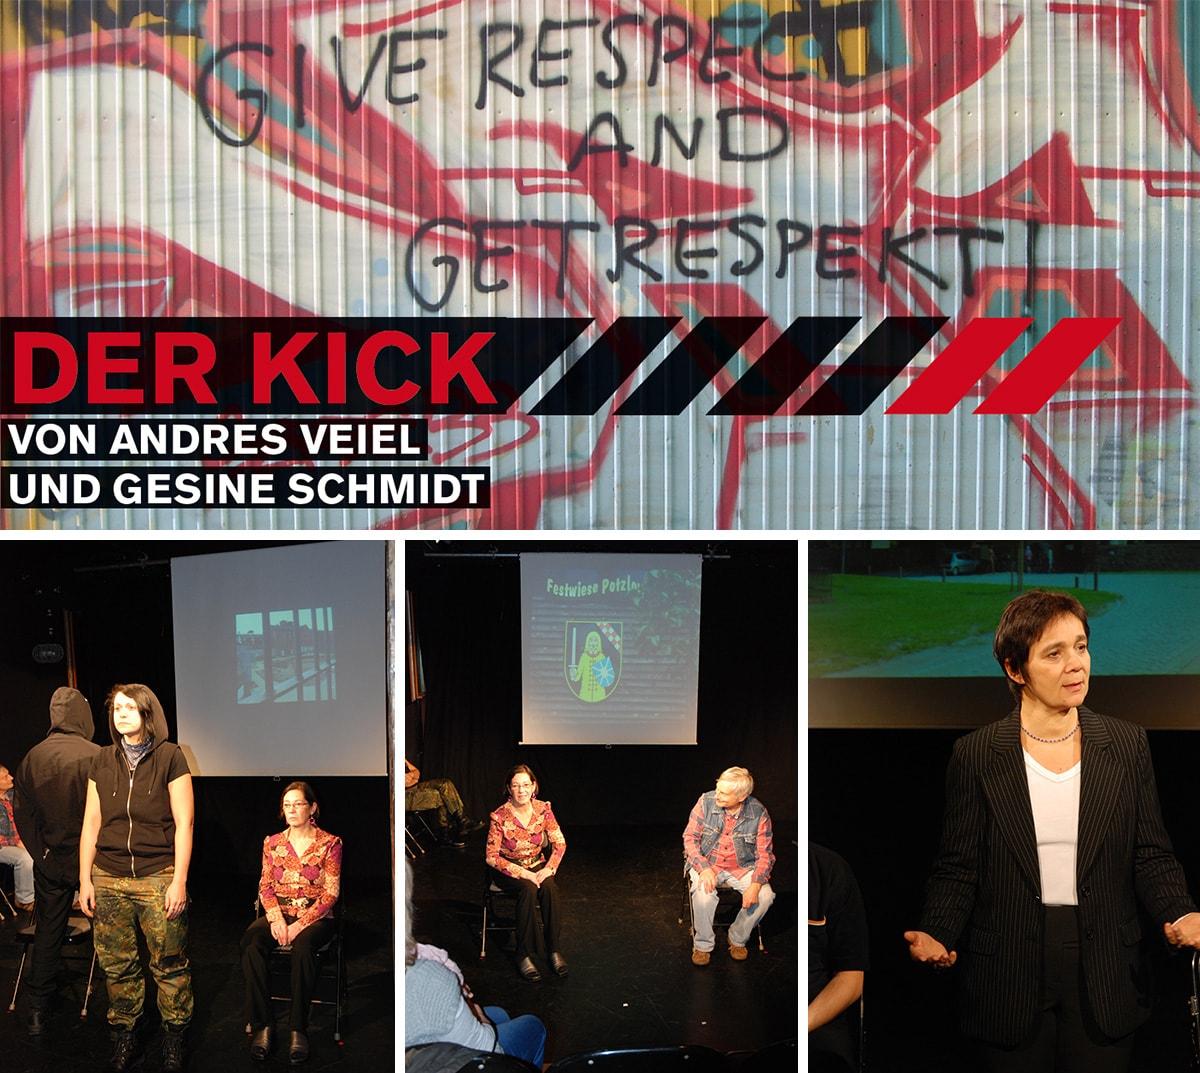 Theaterprojekt Der Kick